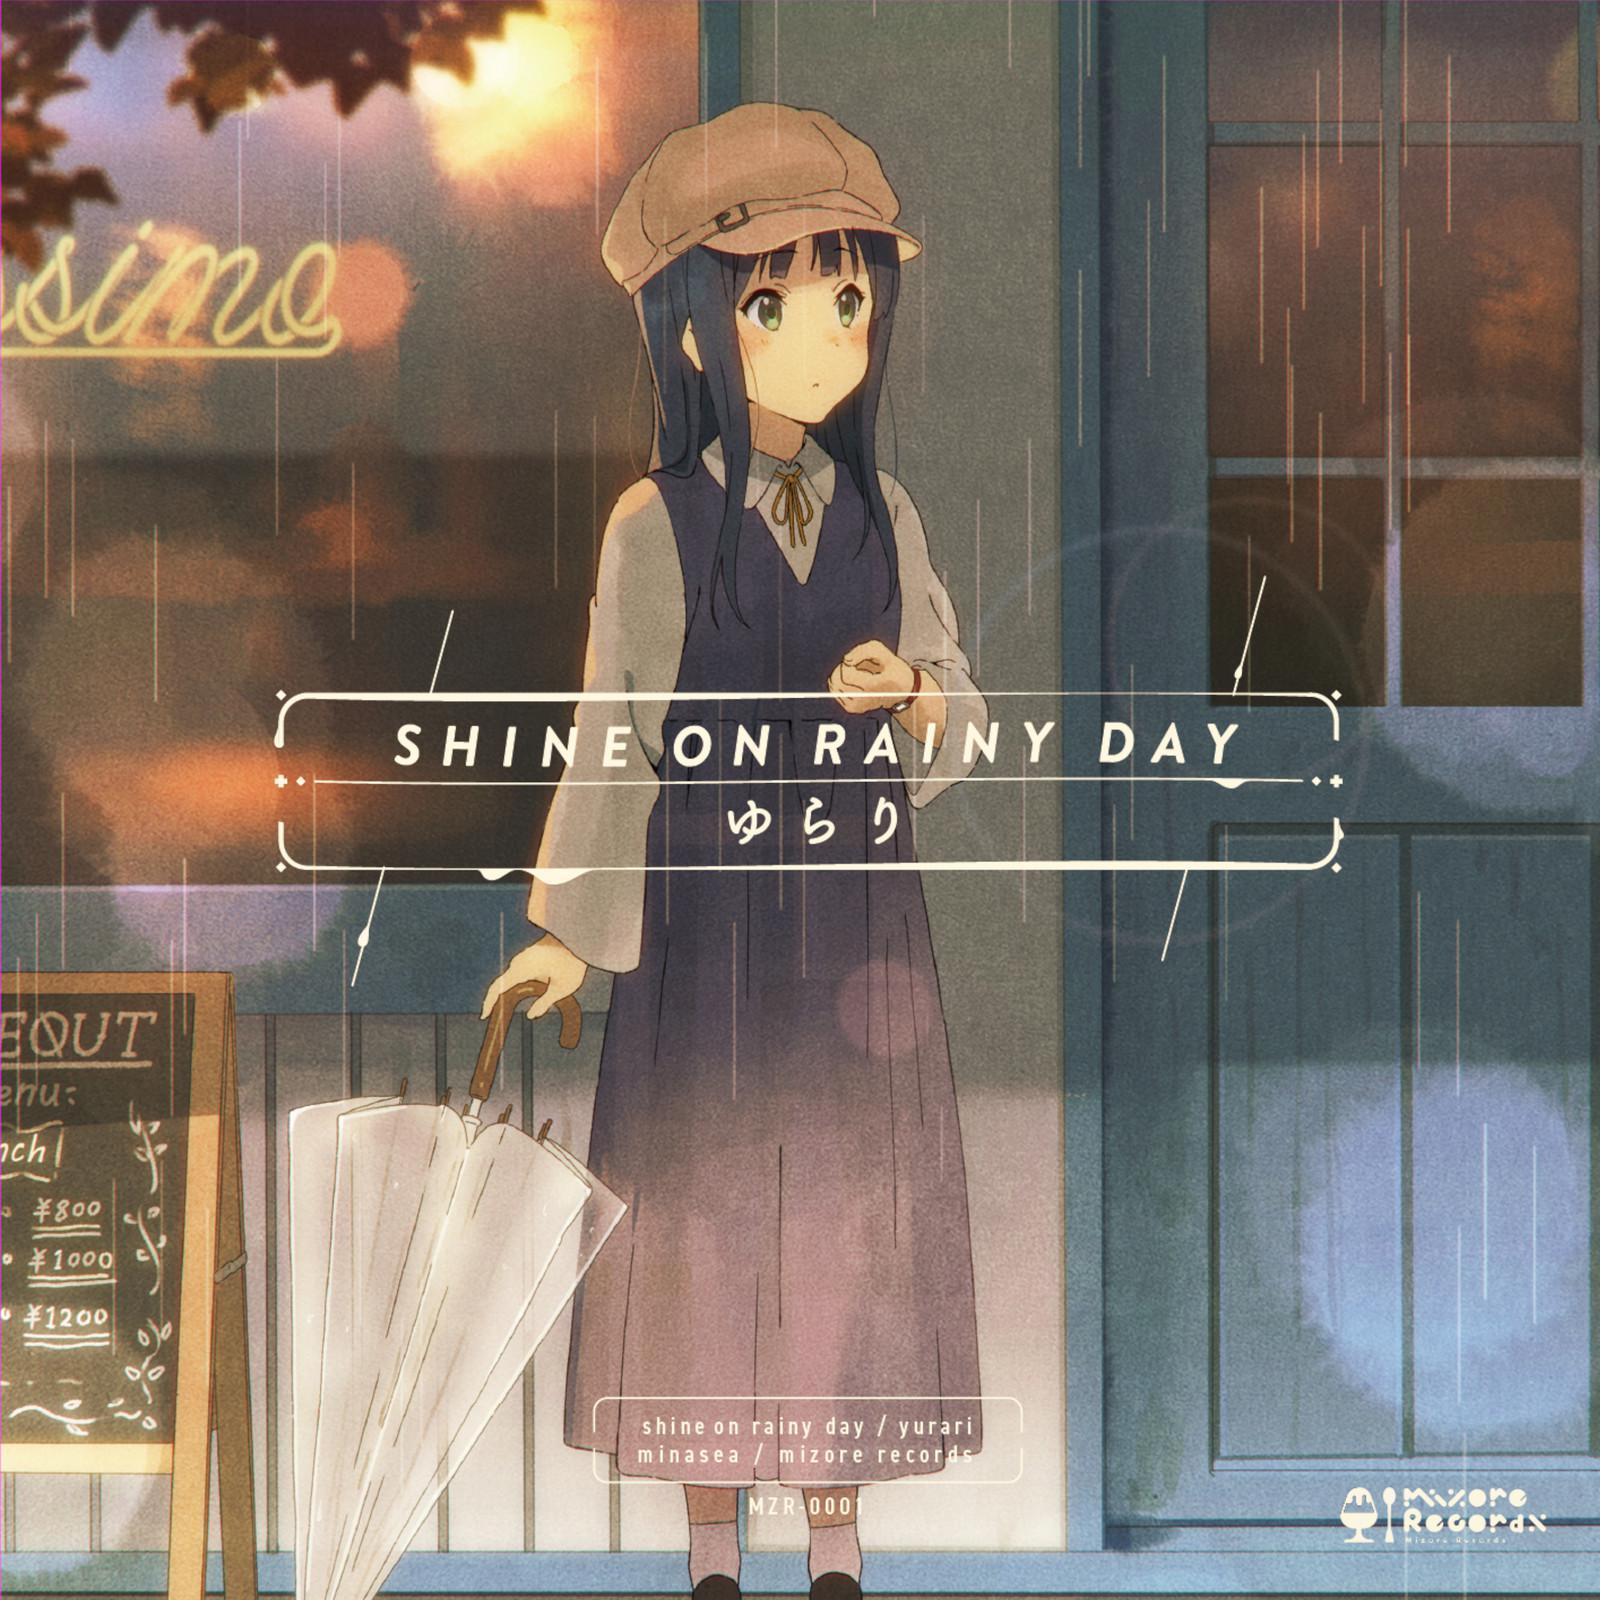 Shine on rainy day / ゆらり